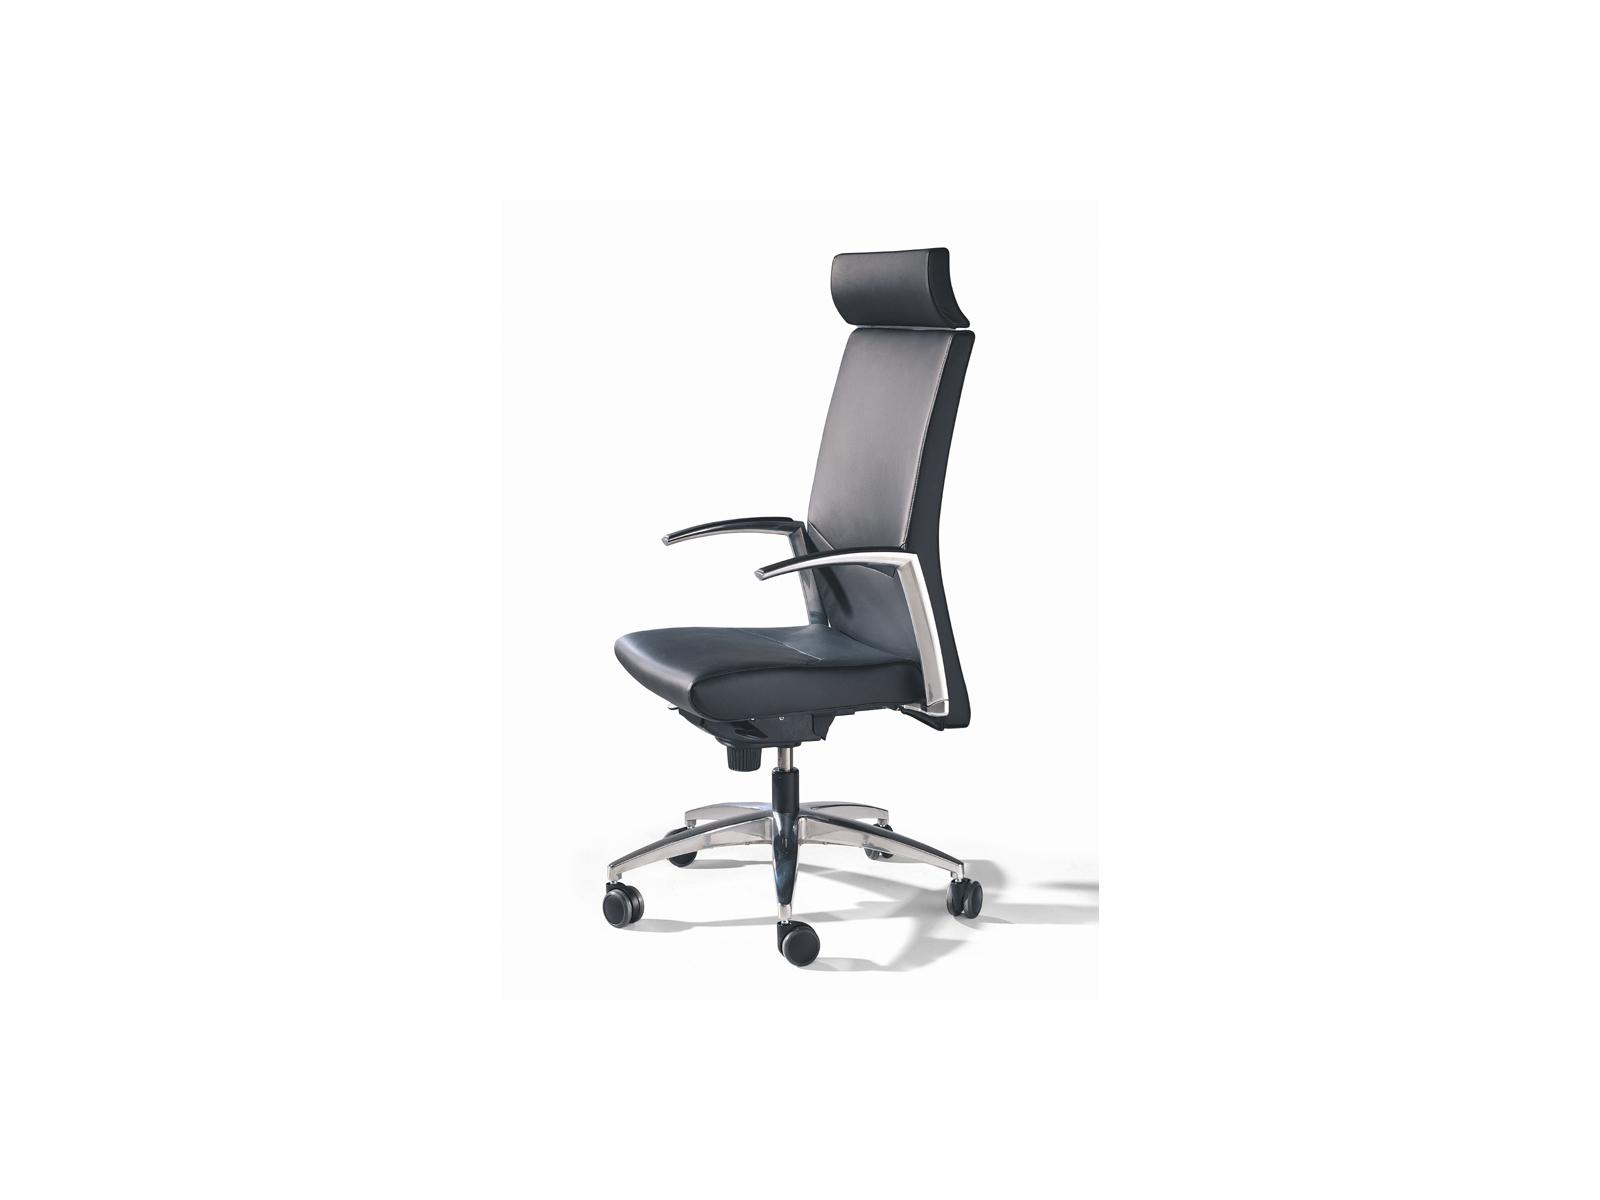 Kado High Back Leather Chair